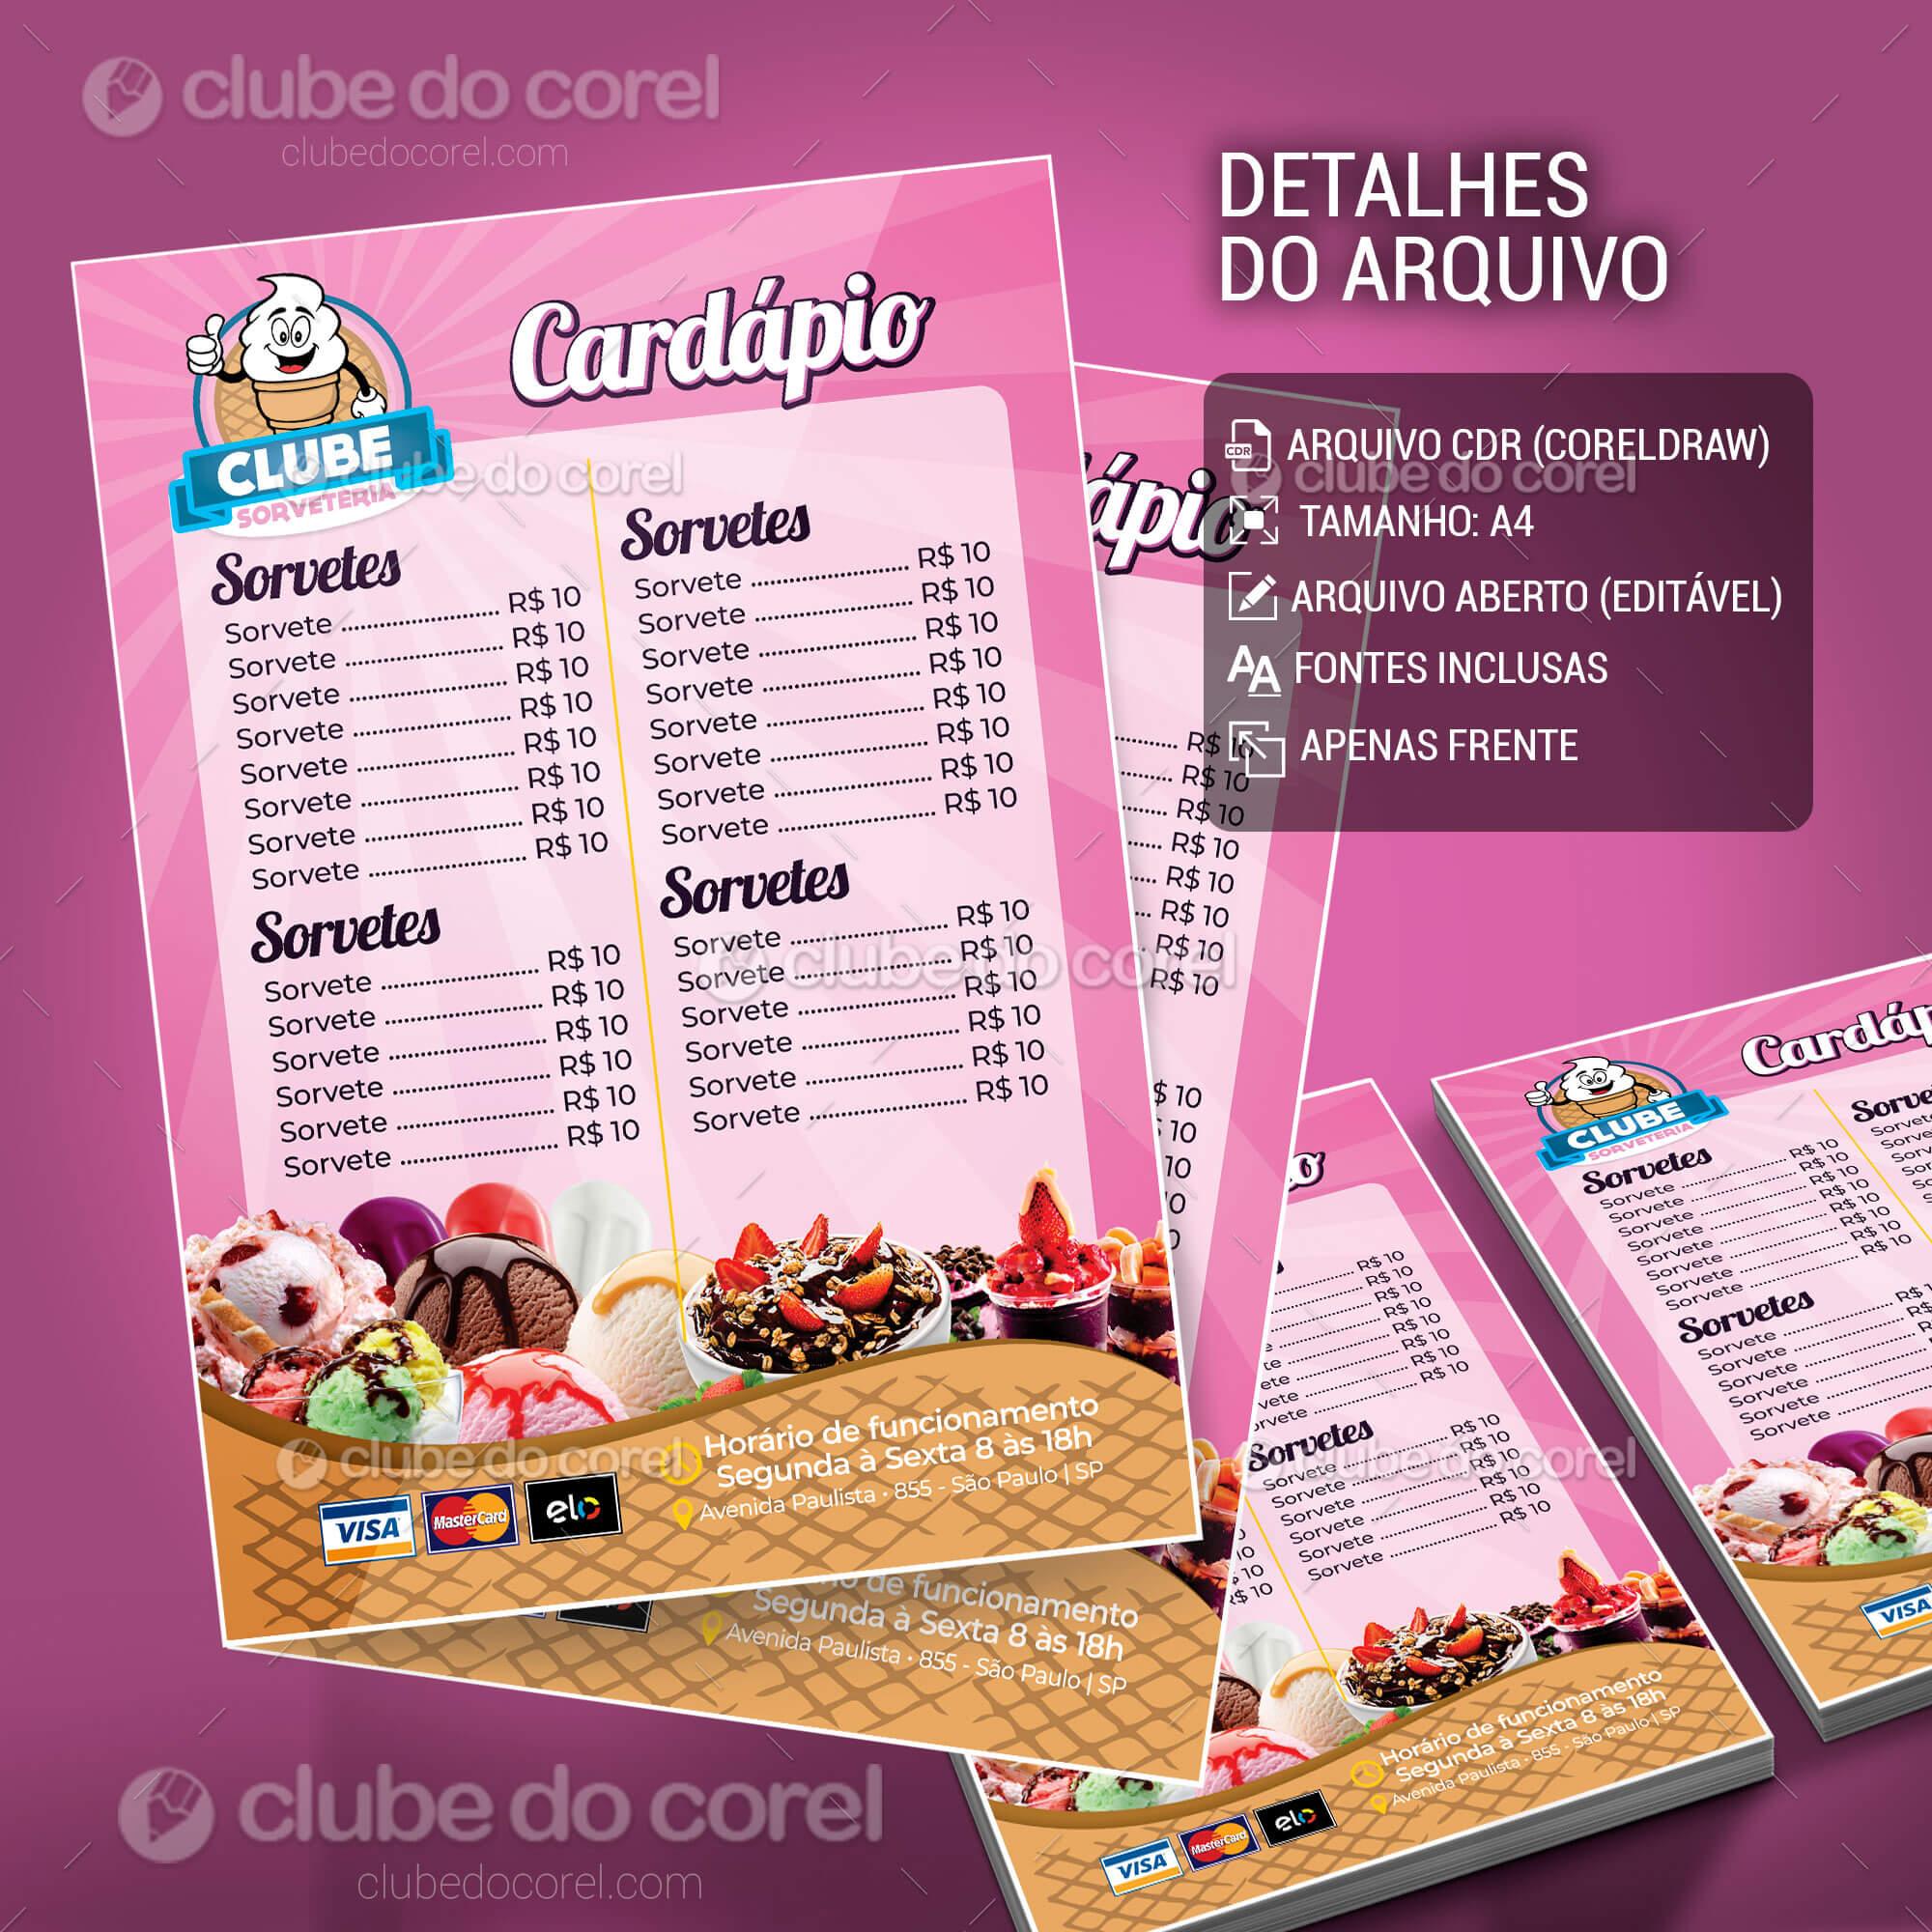 Cardápio Sorveteria Clube Do Corel